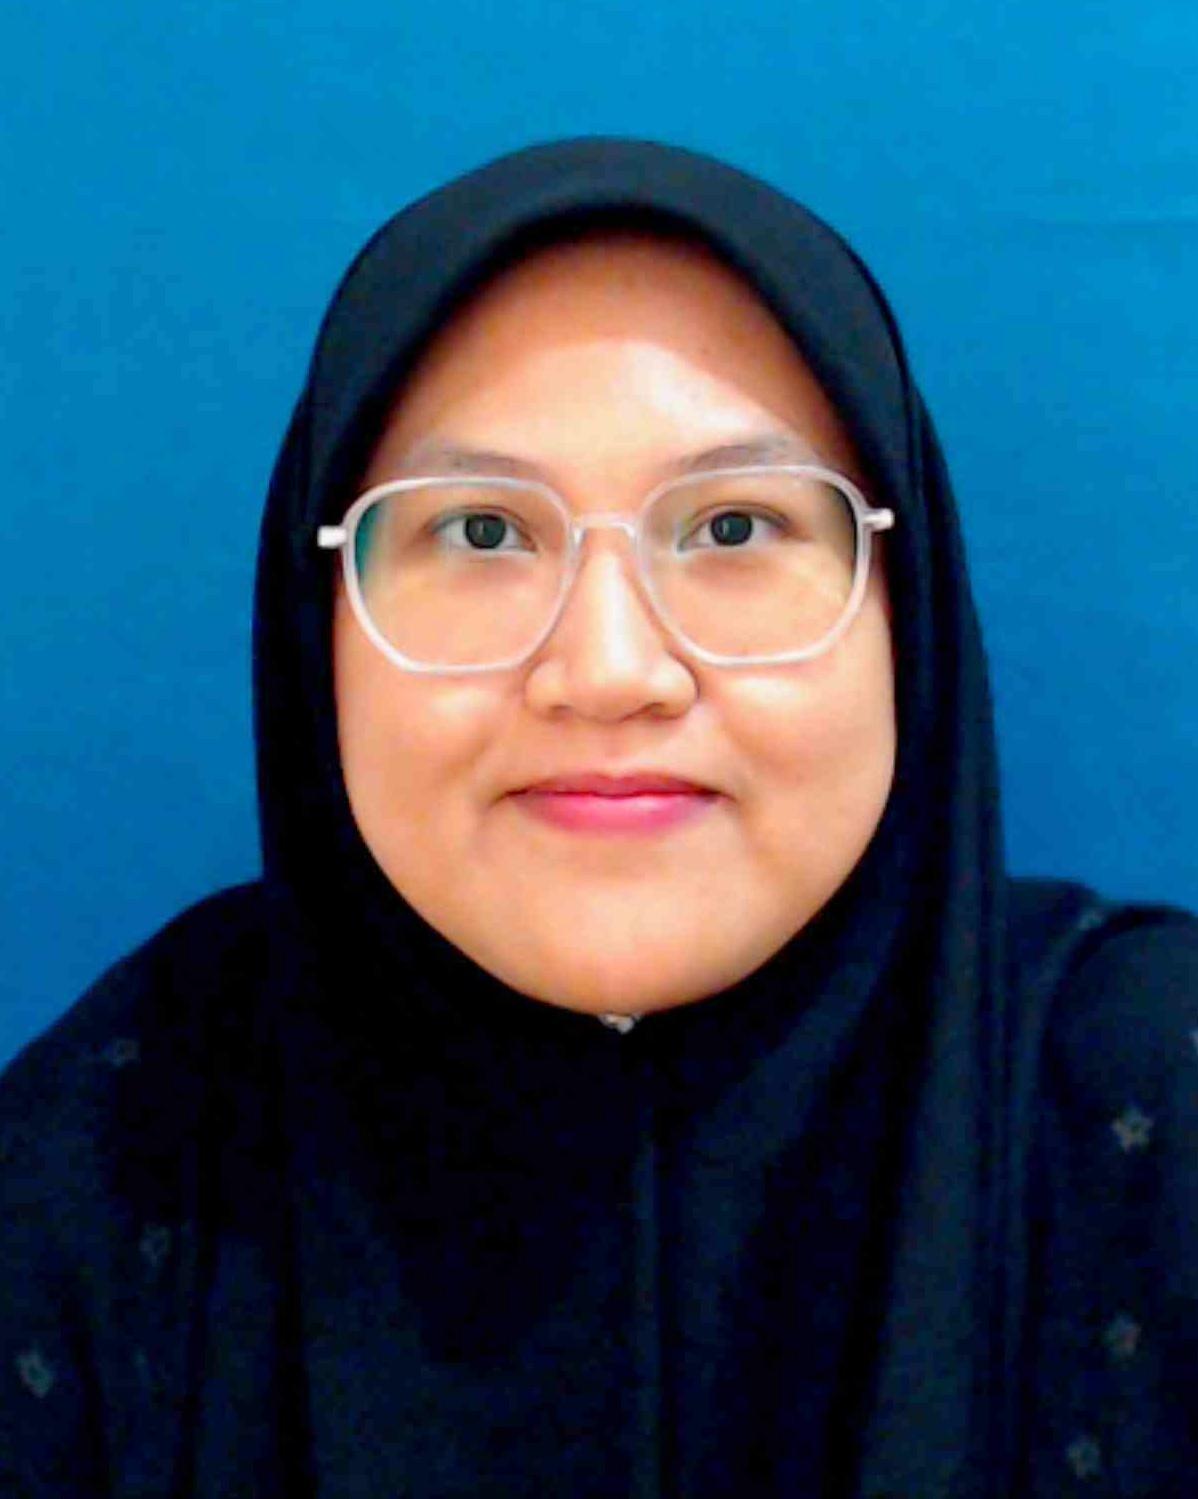 Norsyafini Binti Ahmad Marzuki